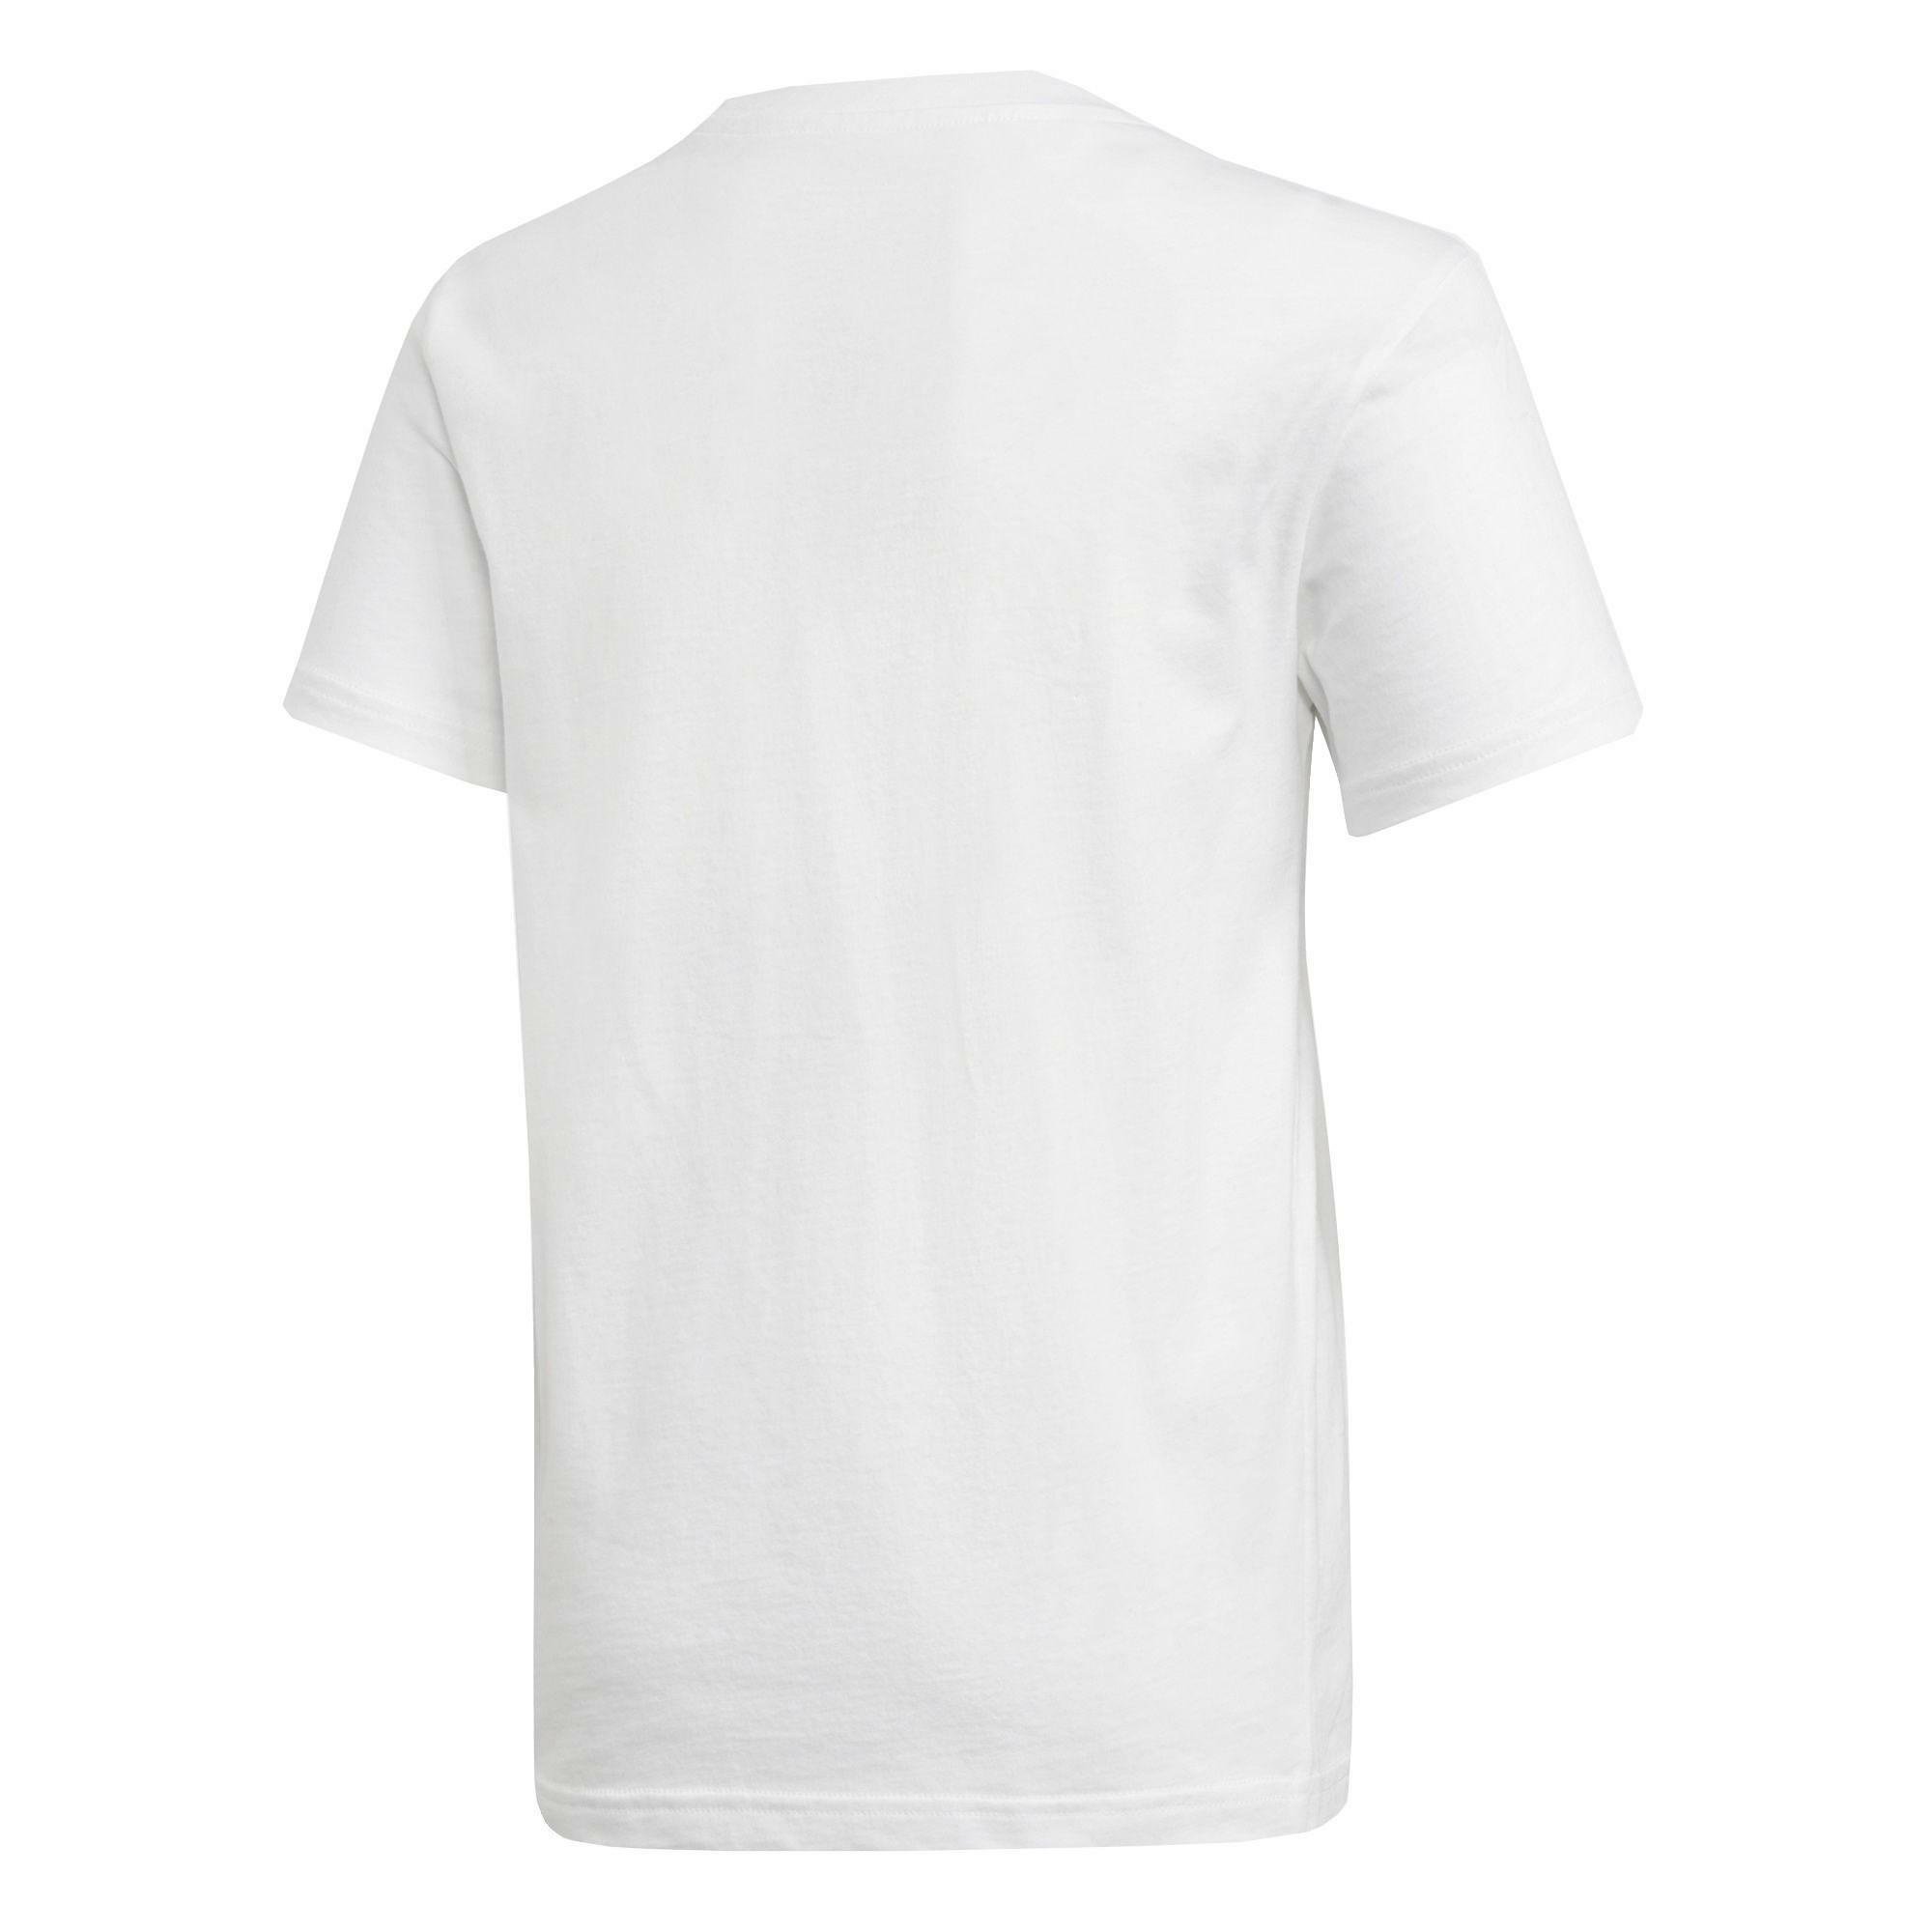 adidas adidas trf t-shirt bambino bianca dh2708